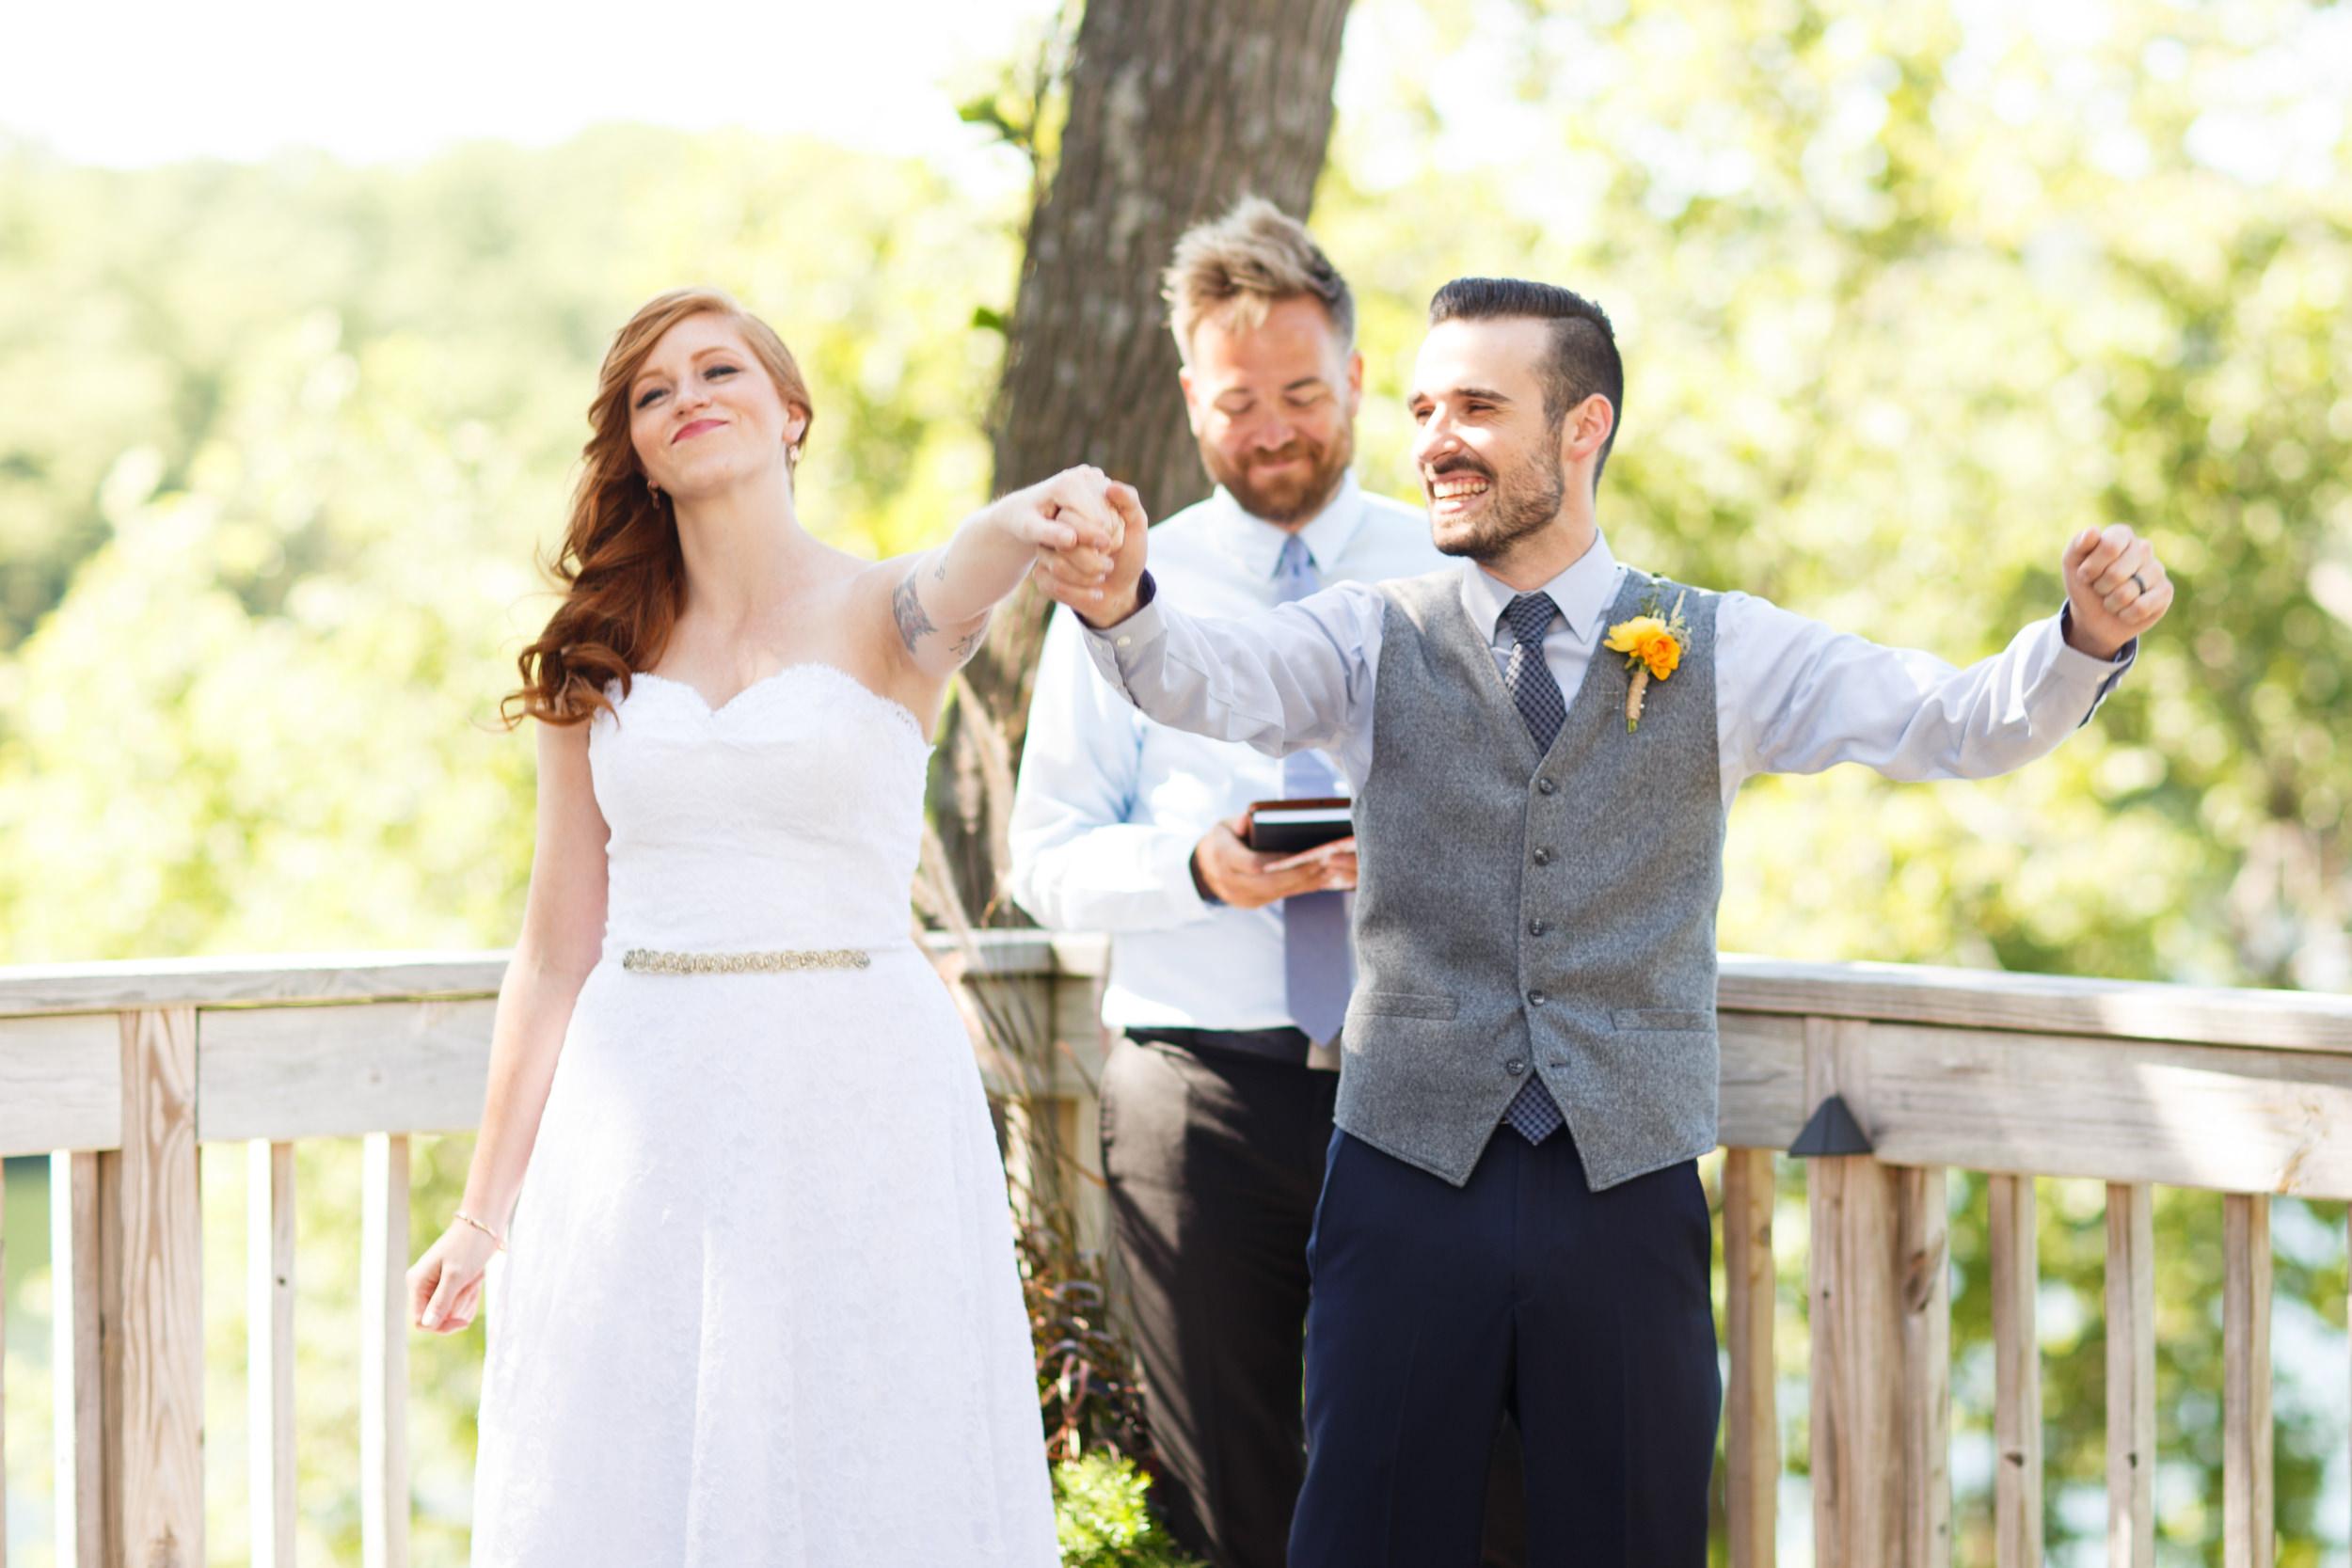 7-25-2015 Sarah and Jimmy's Eagle Ridge Downtown Galena Wedding-154.jpg